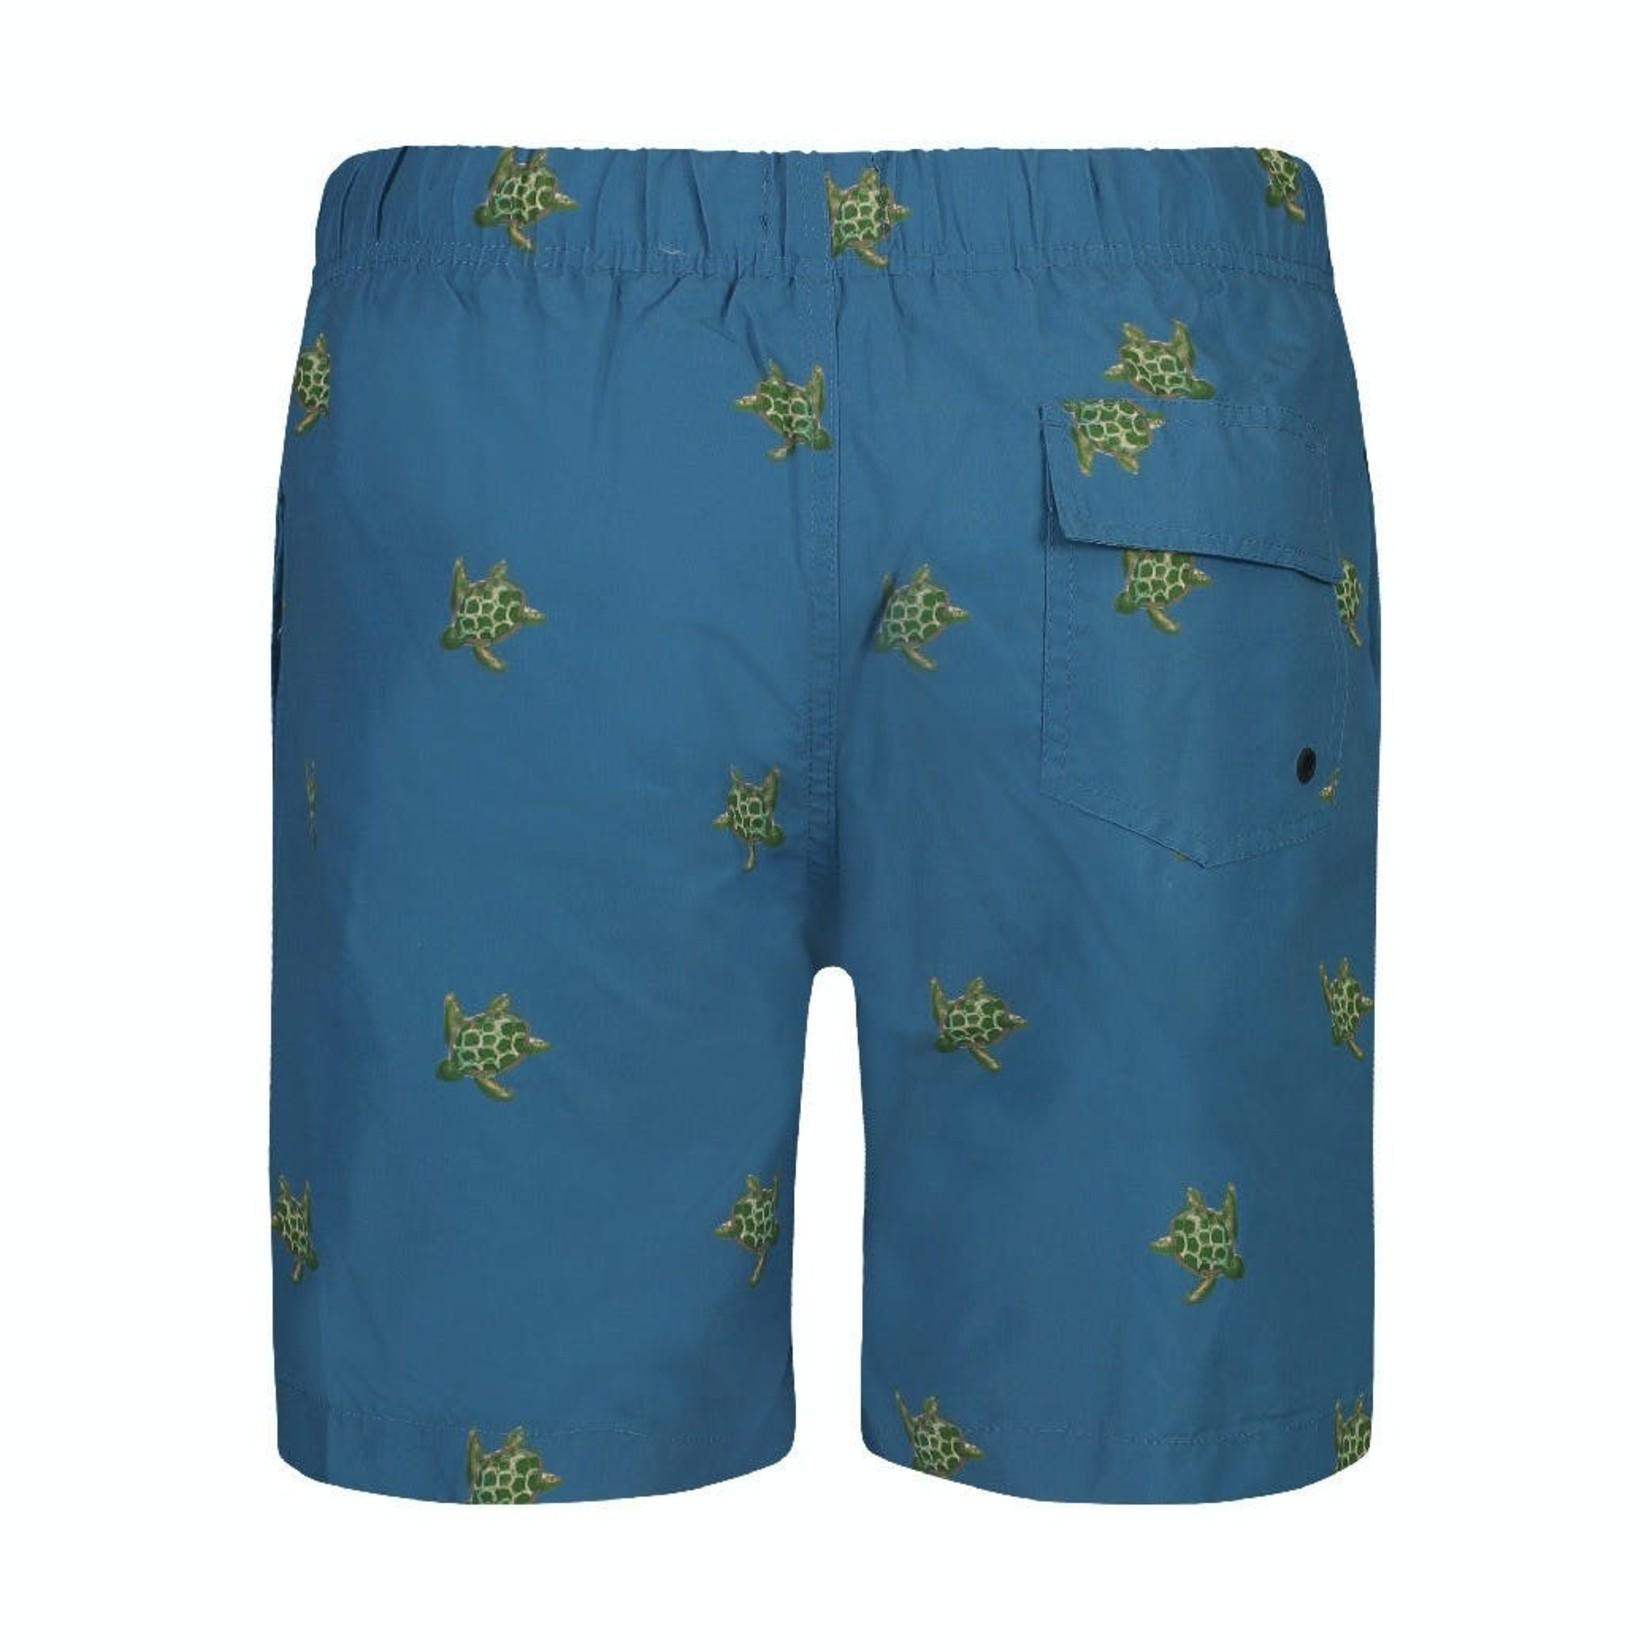 Shiwi Shiwi zwemshort blauw schildpadden